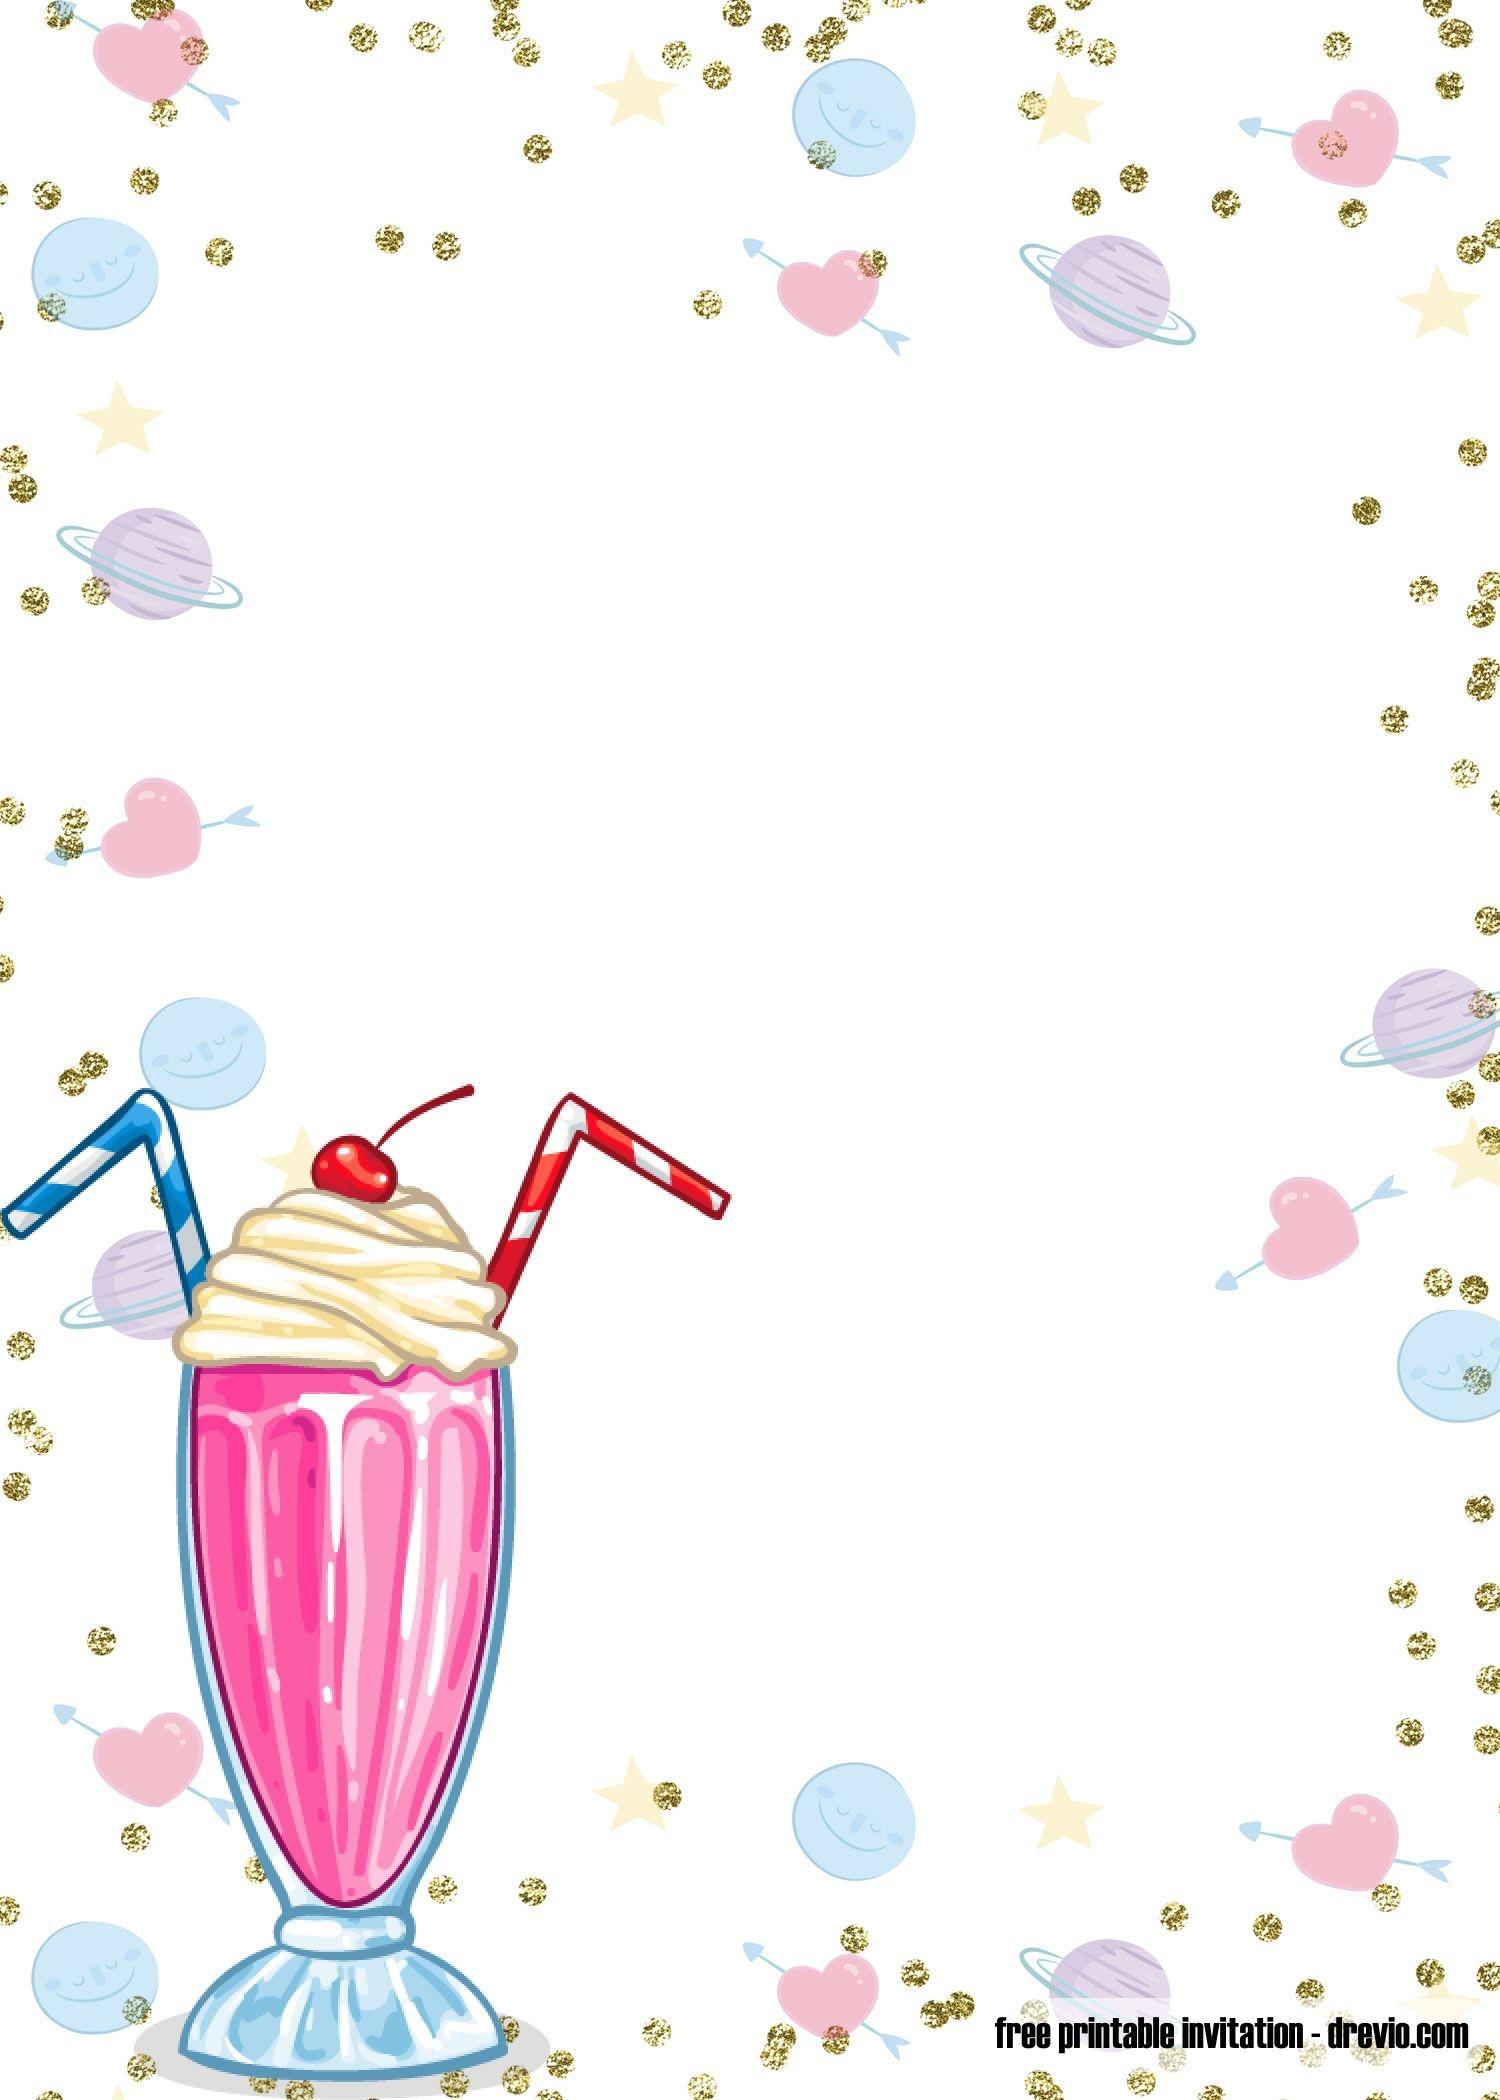 Free Printable Ice Cream Birthday Invitation | Free Printable - Ice Cream Party Invitations Printable Free